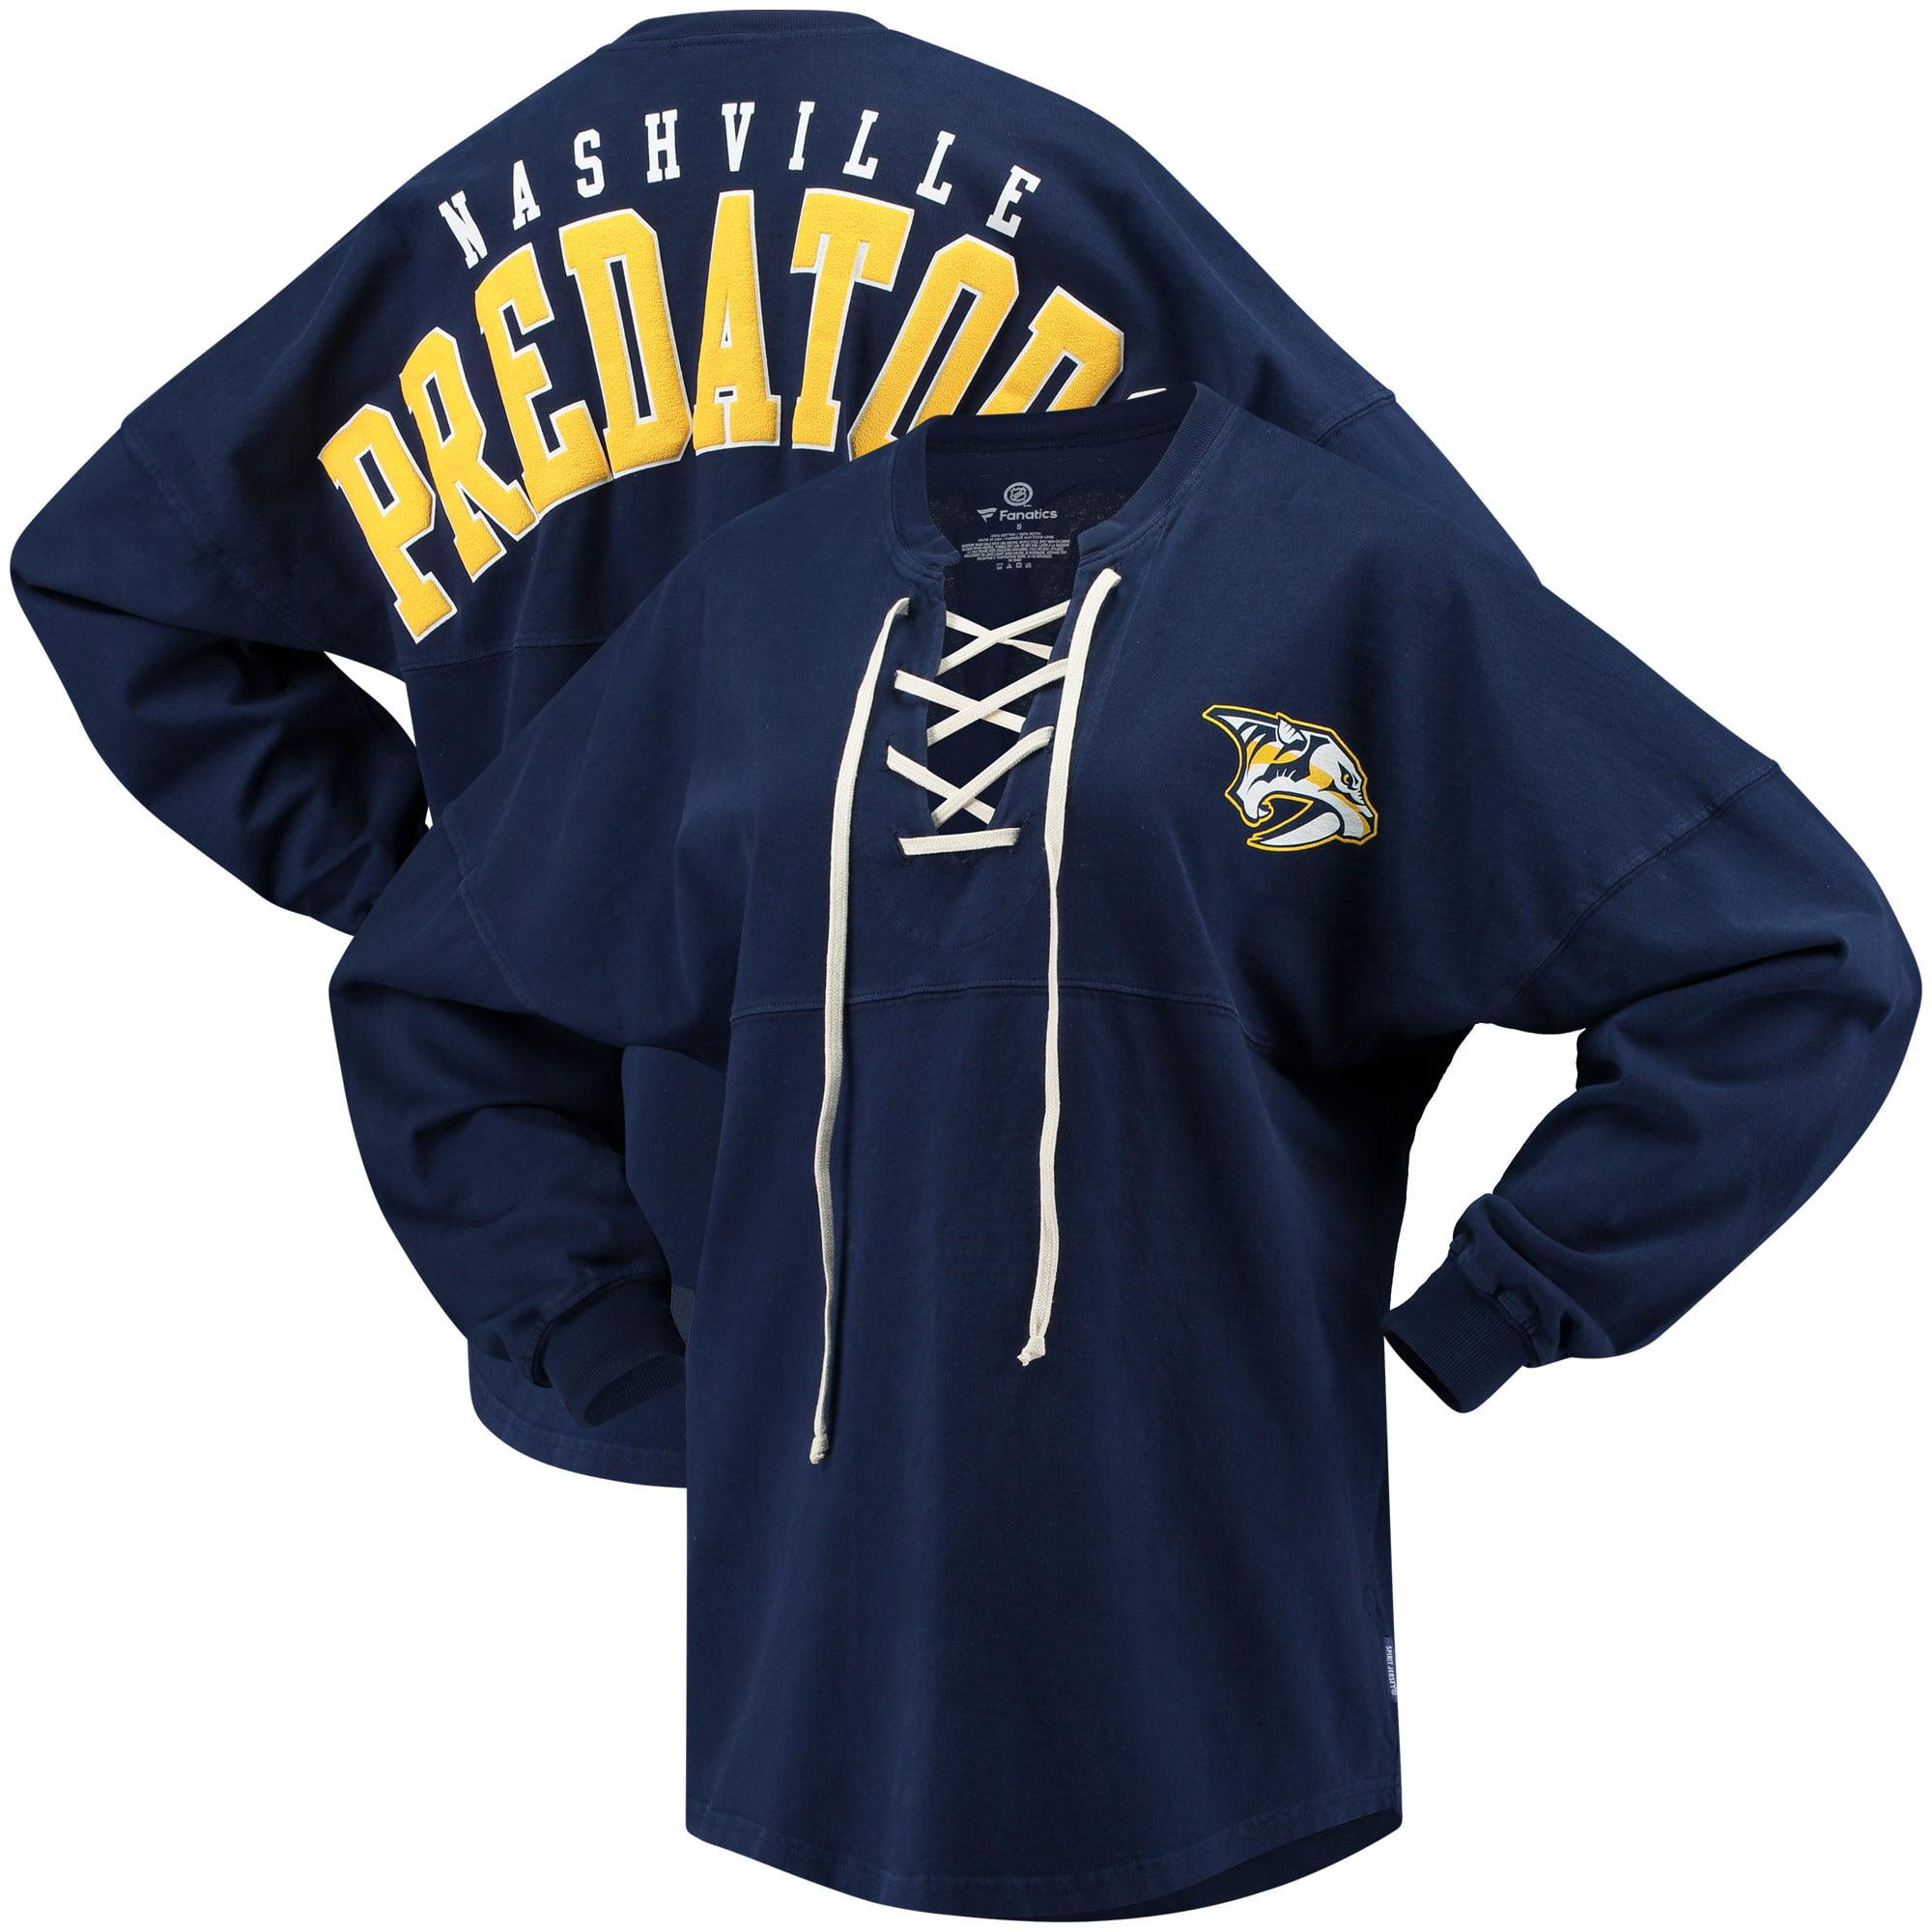 Nashville Predators Fanatics Branded Women's Lace Up Long Sleeve Spirit T-Shirt Navy by BoxSeat Clothing - SOURCED